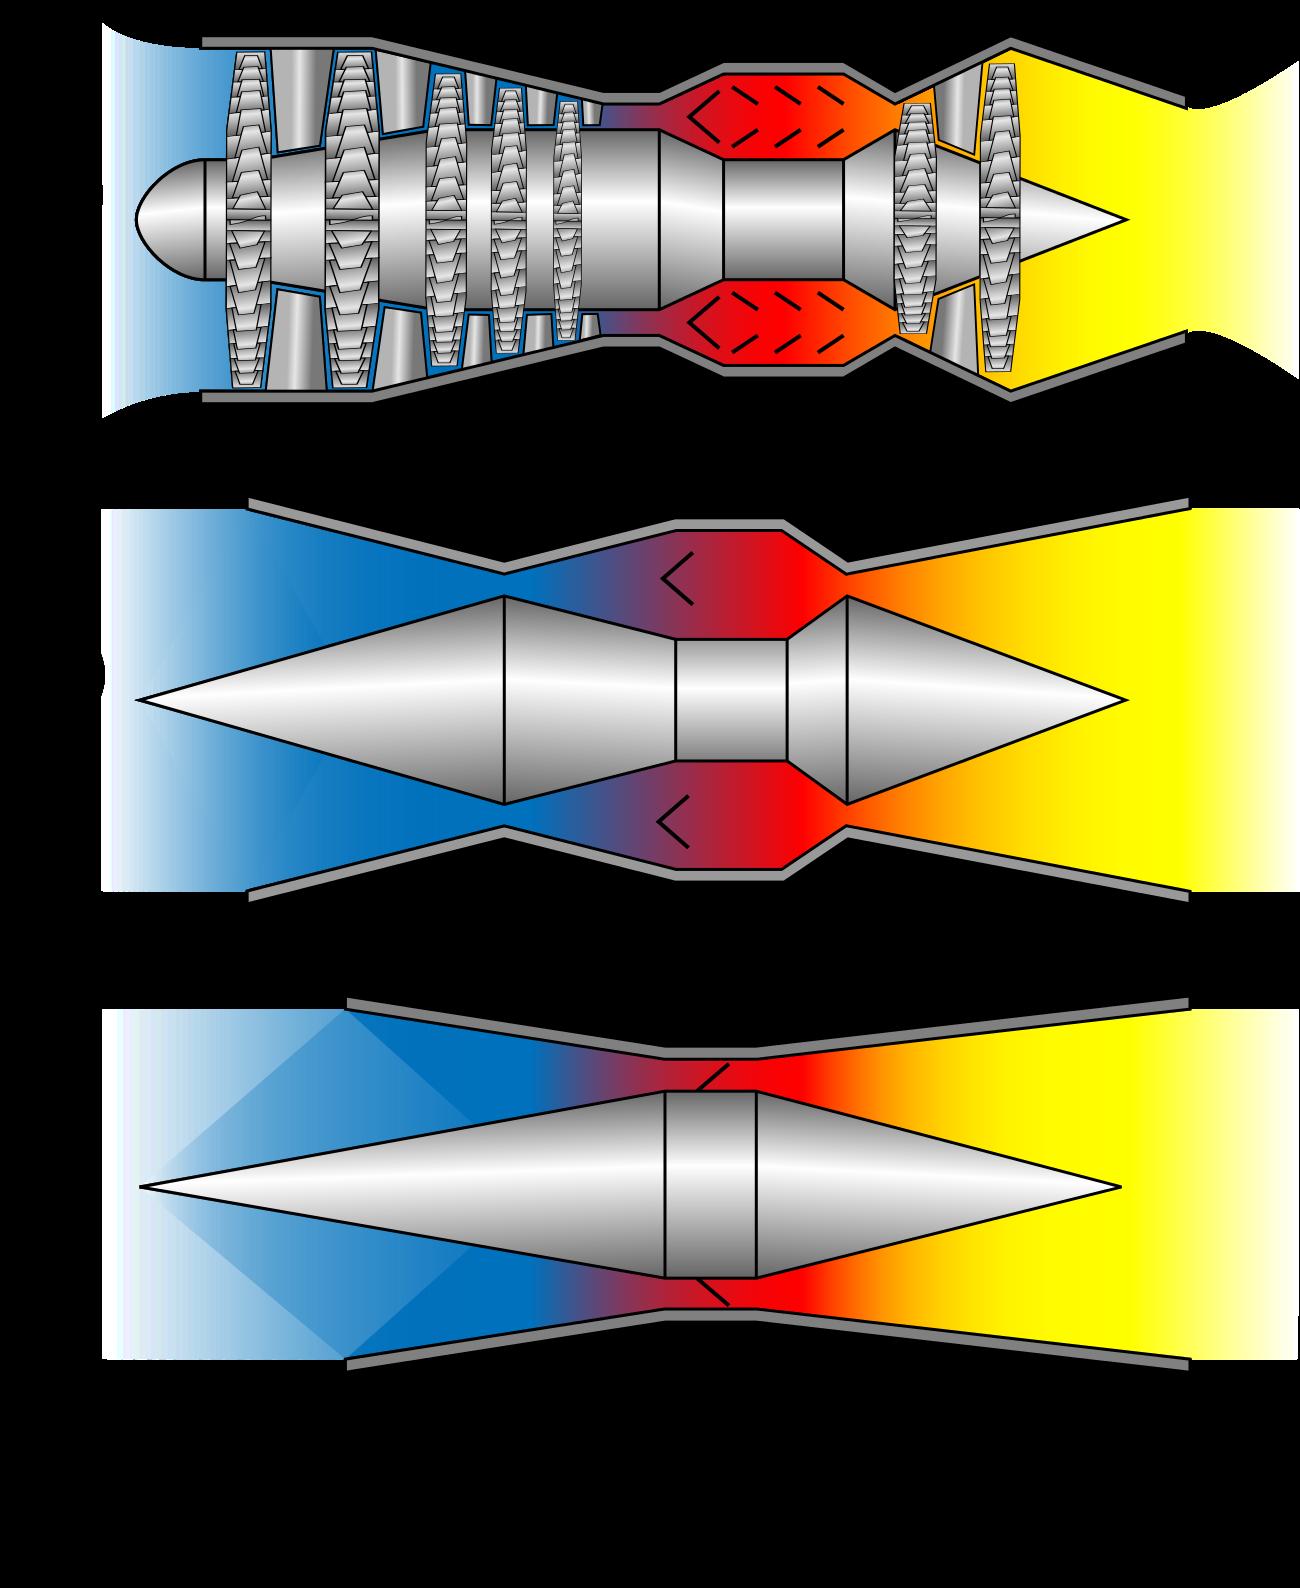 Scramjet Rotc Pinterest Aircraft Jet Engine And Engineering Turbine Diagram Aviation Motor Works Design Space Ship Ultralight Plane